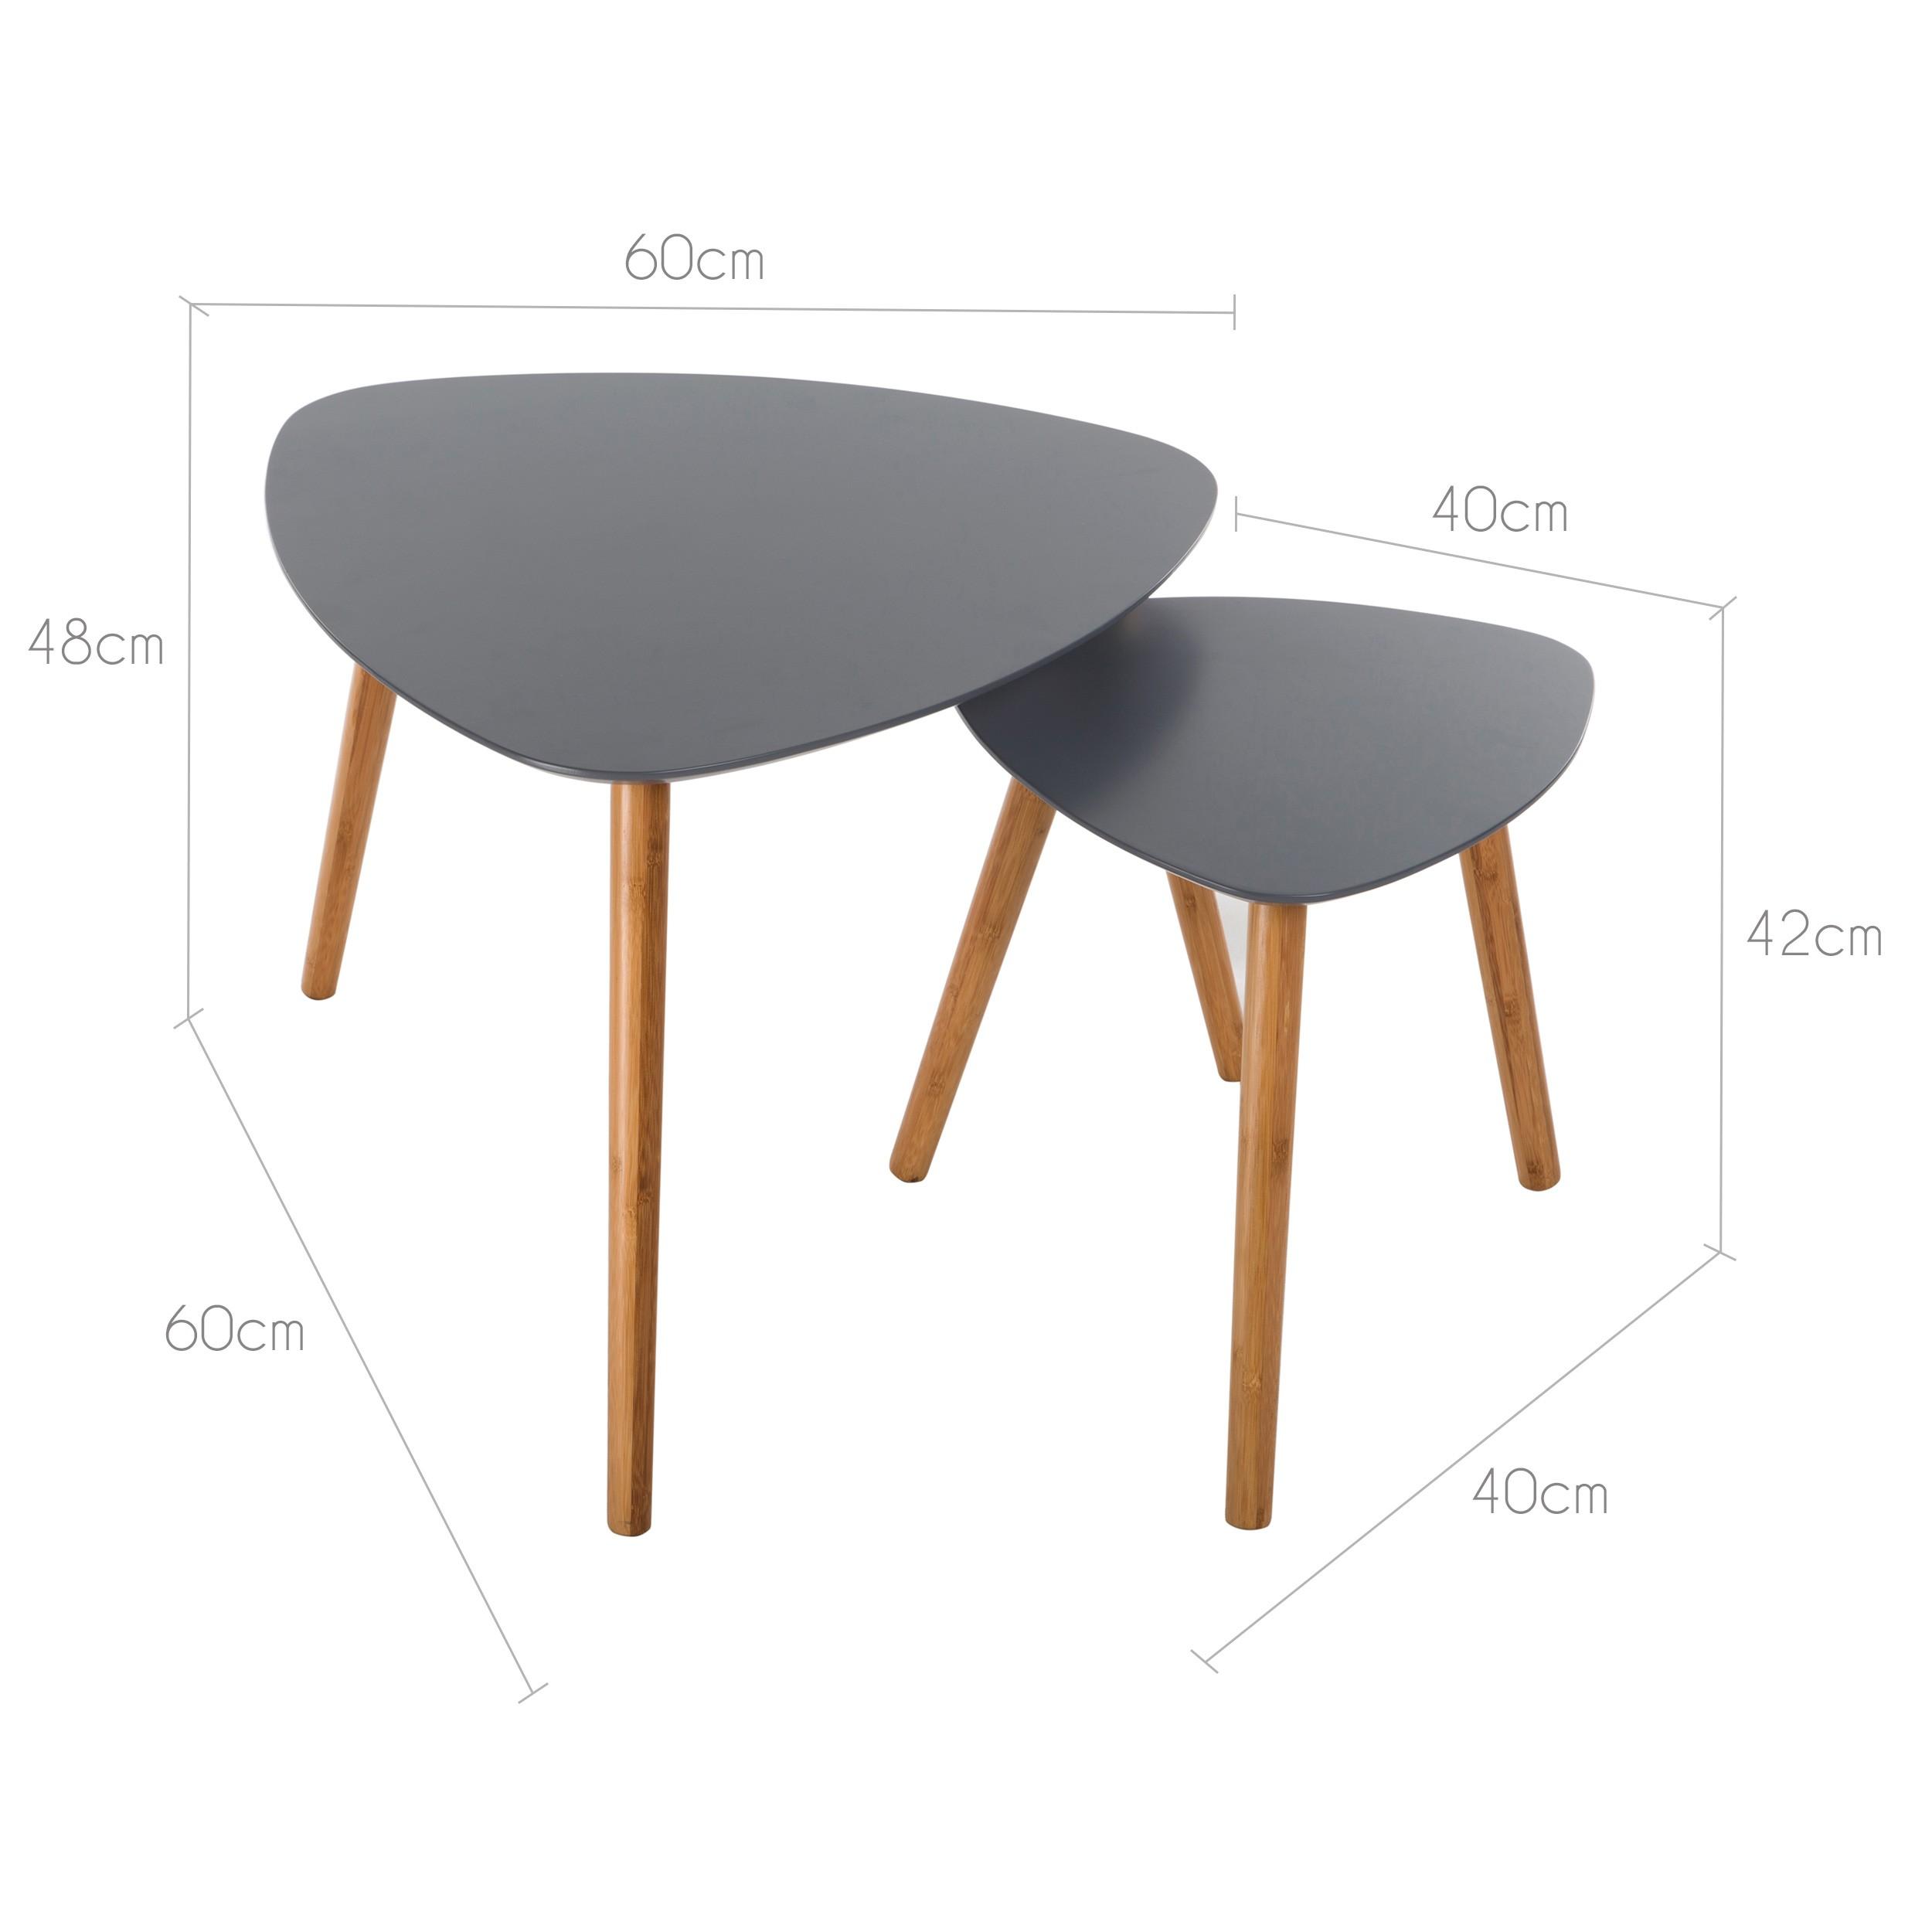 table basse scandinave grise lot de 2 commandez nos tables basses scandinaves grises lot de. Black Bedroom Furniture Sets. Home Design Ideas